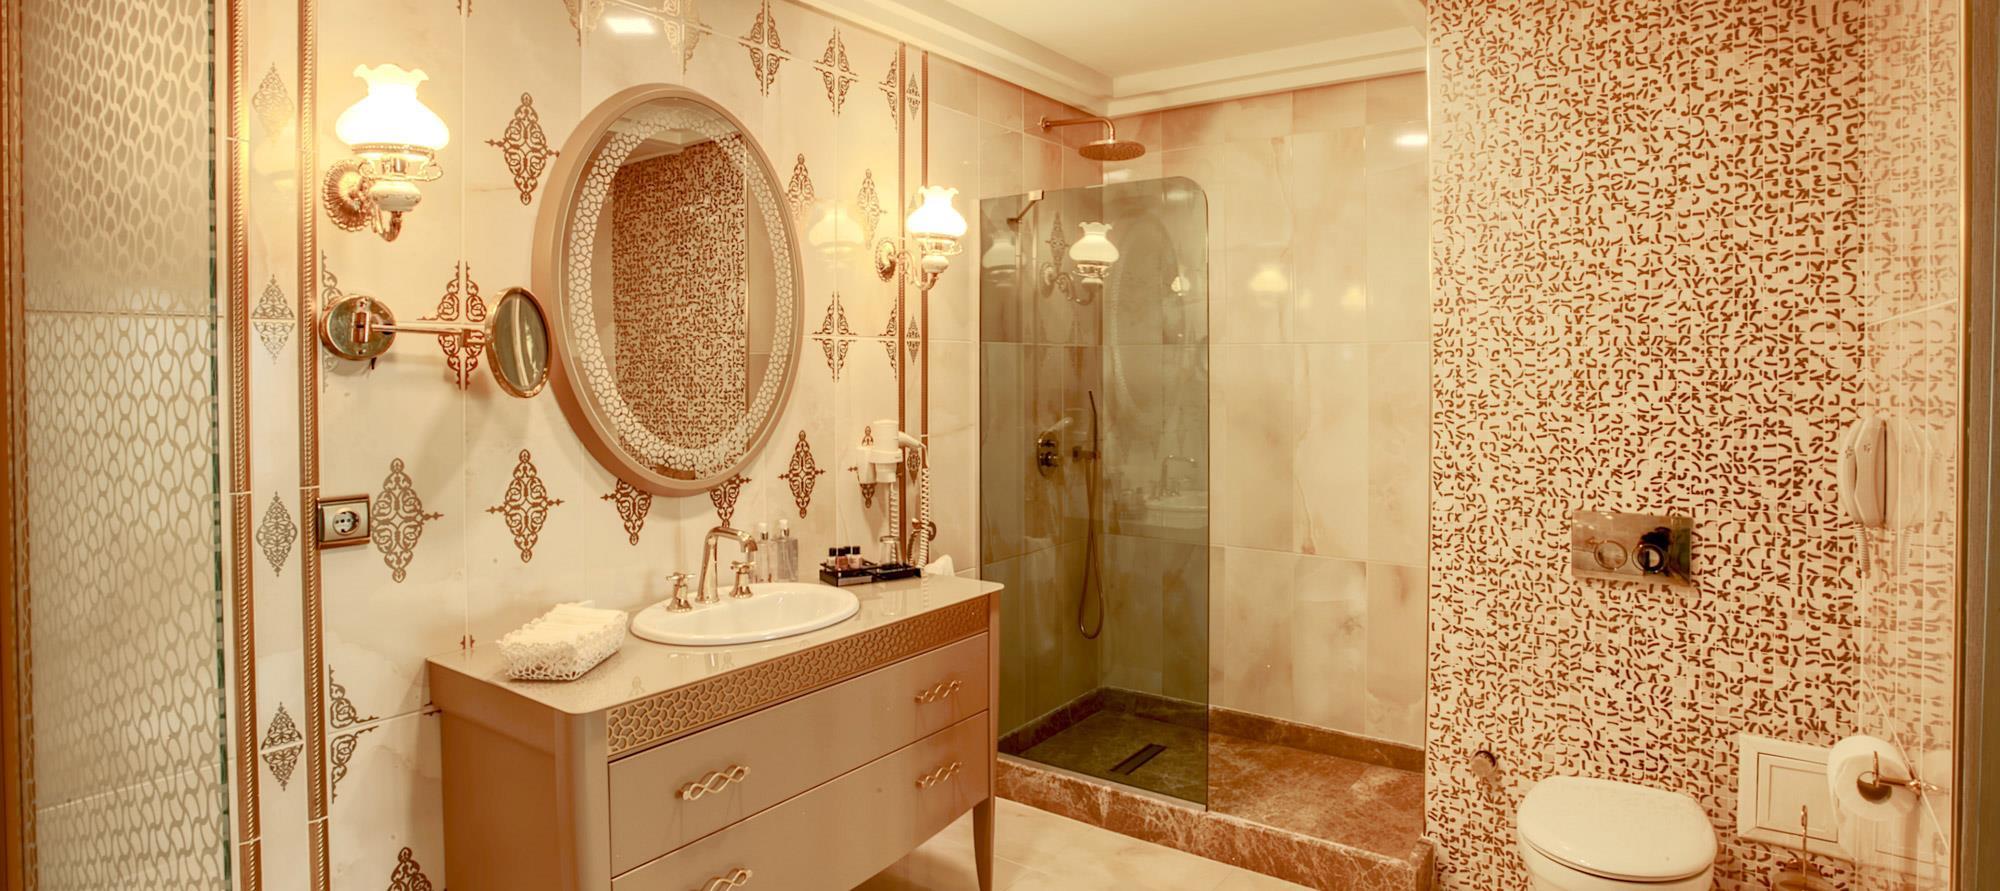 Grand Makel Hotel Topkapi254615